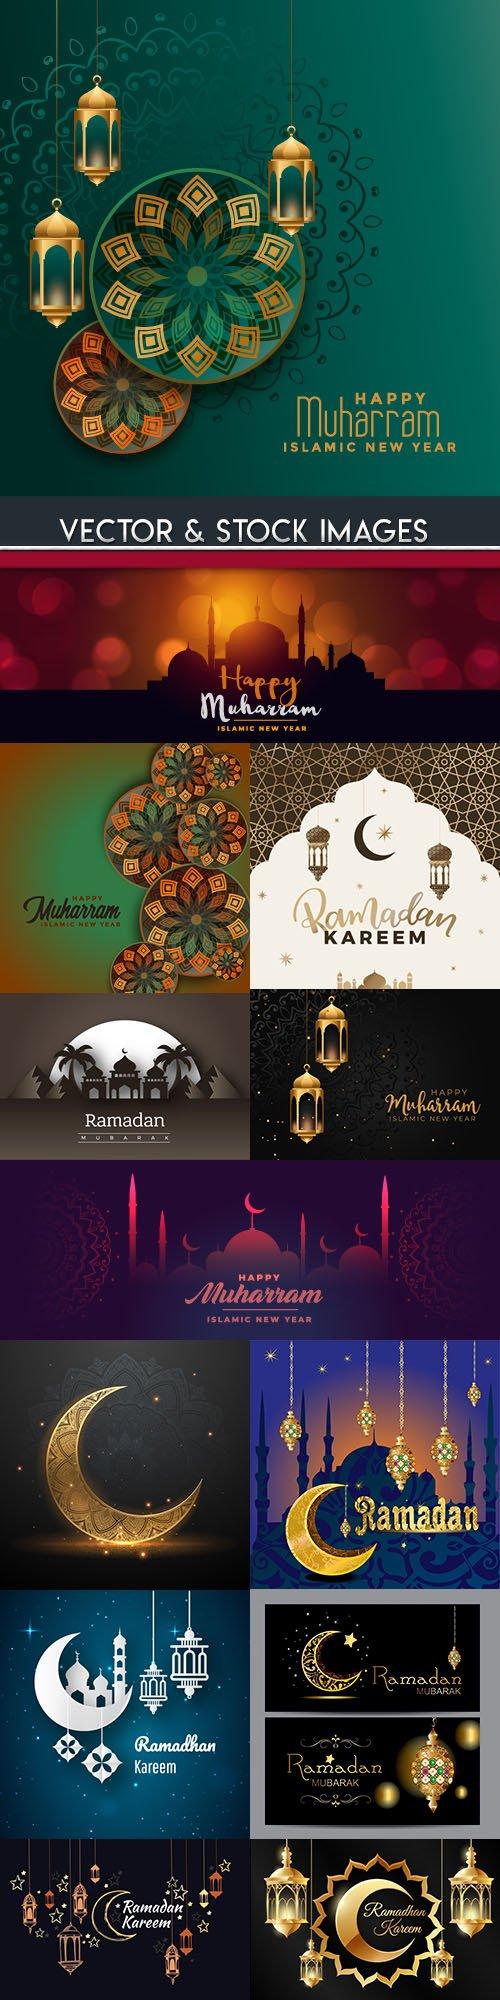 Ramadan Kareem Islamic culture collection illustrations 16